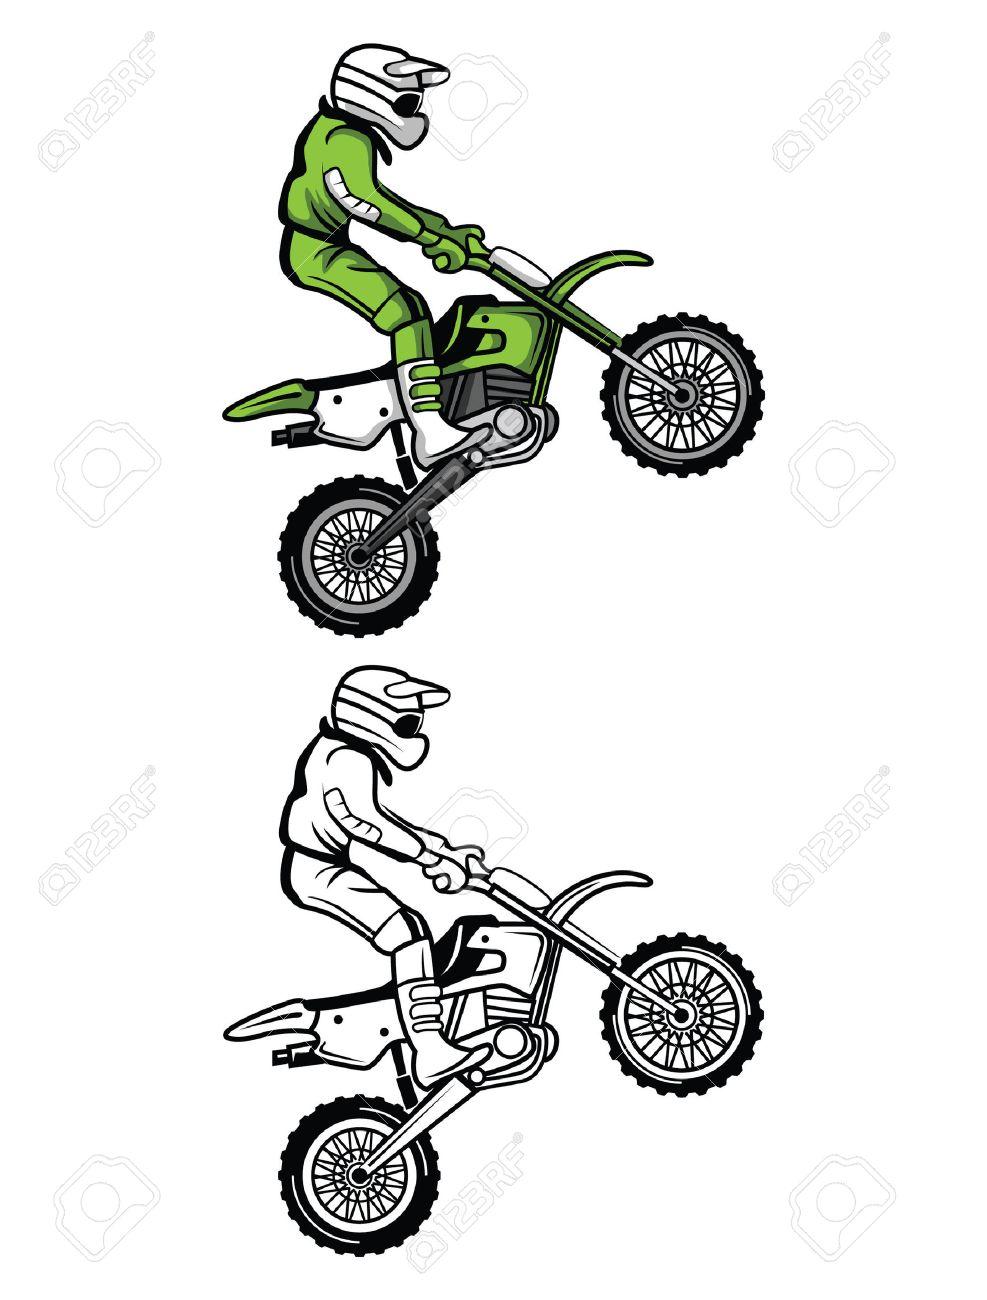 Coloring Book Moto Cross Cartoon Character Royalty Free Cliparts Vectors And Stock Illustration Image 37576895